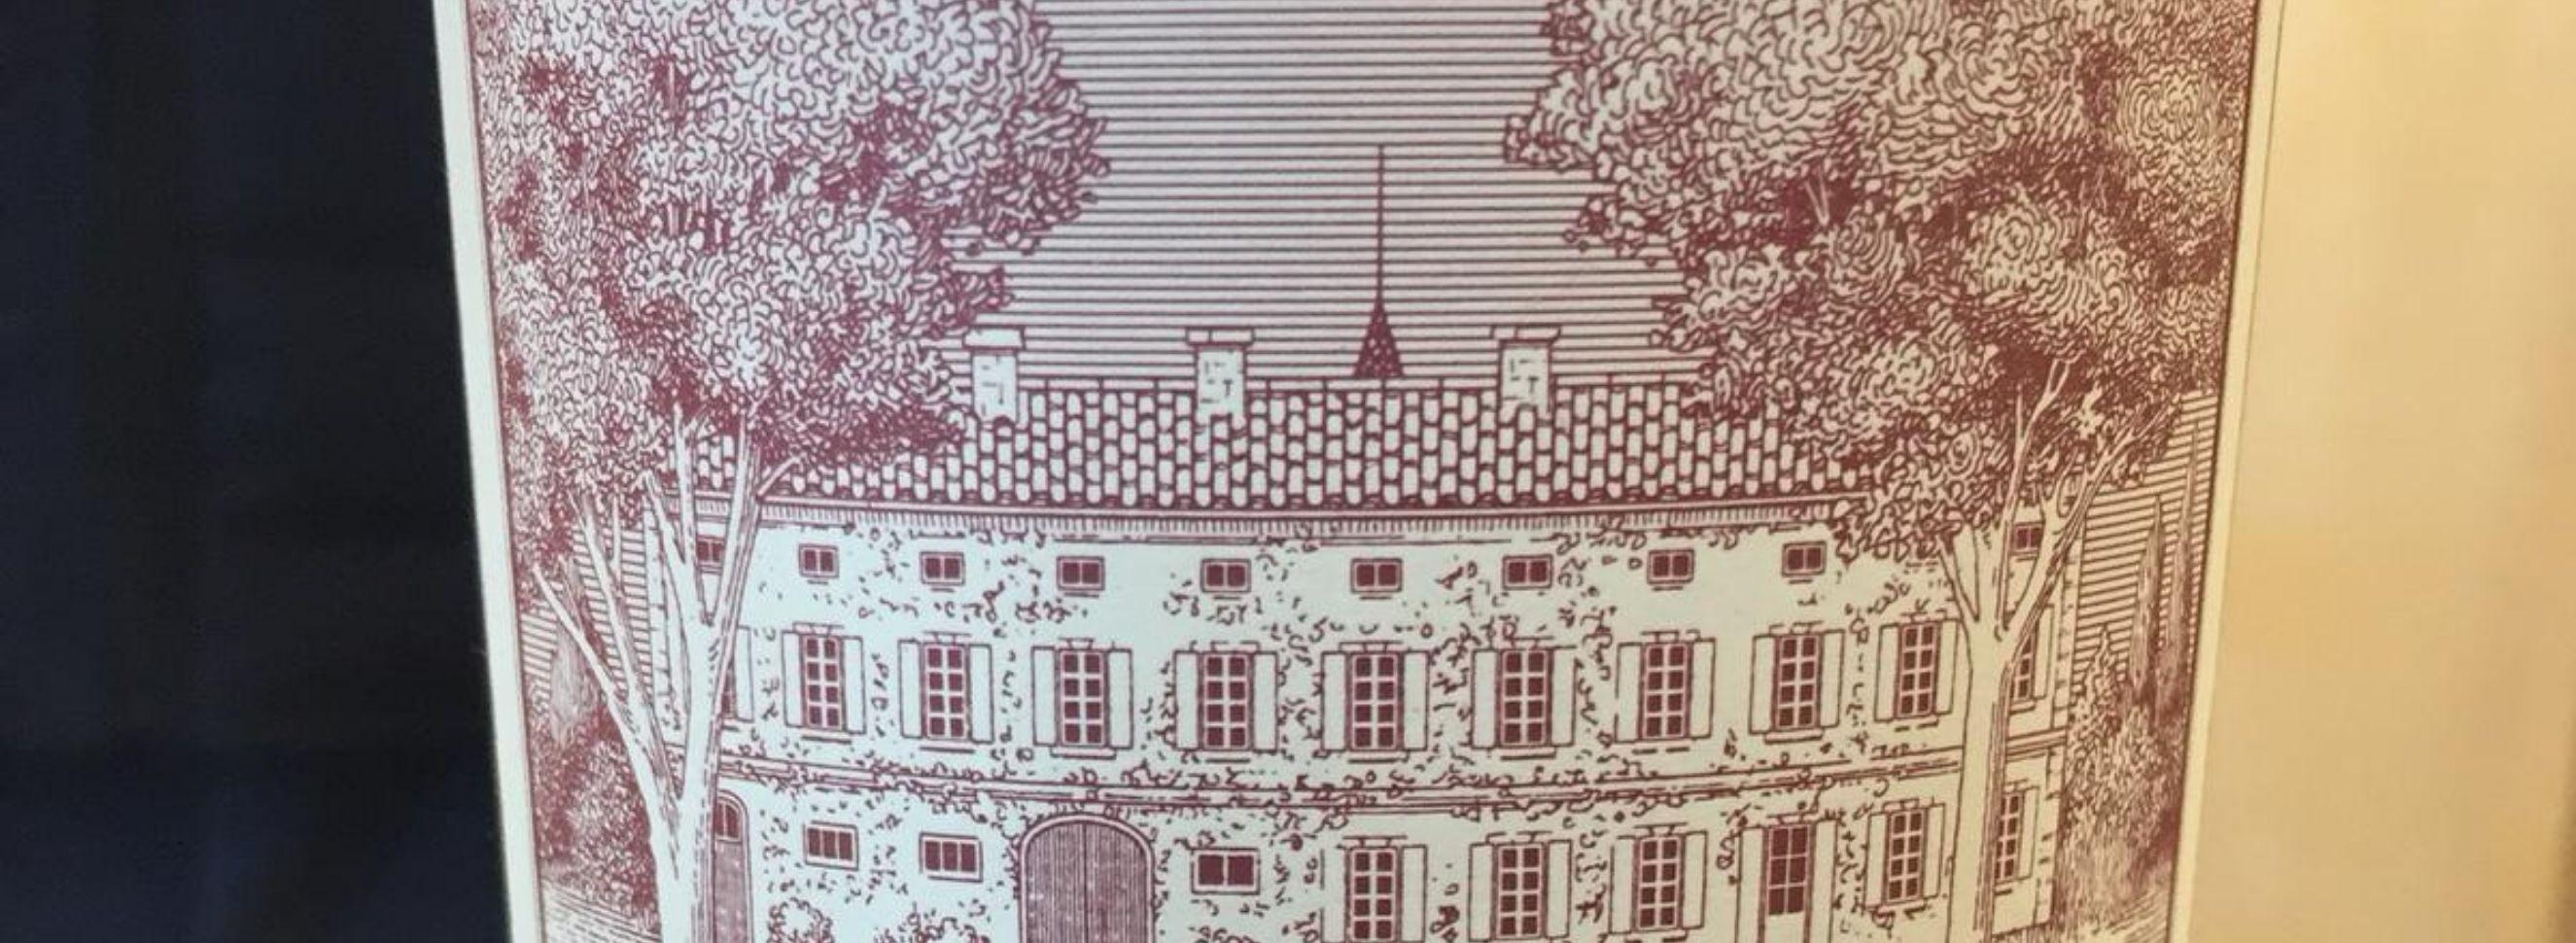 Edouard Labruyère's Château Rouget